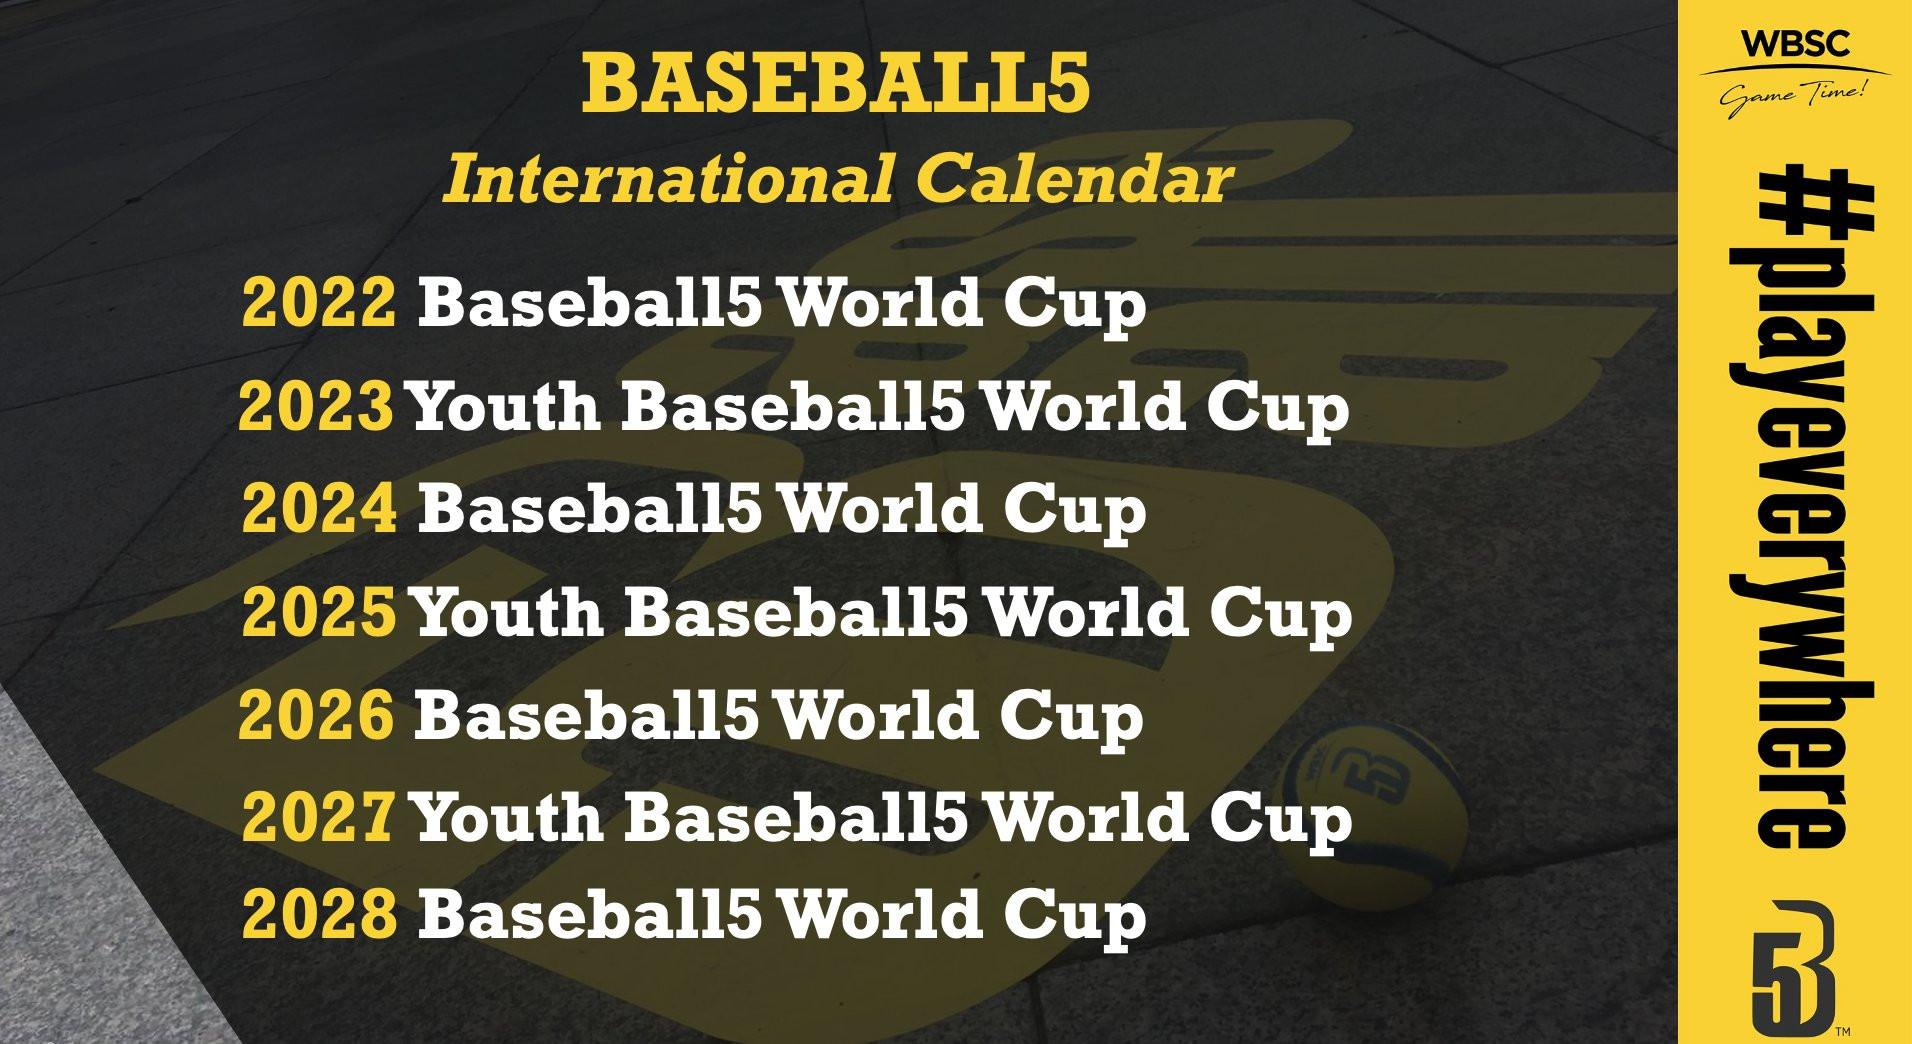 An international calendar for Baseball5 events has been outlined ©WBSC